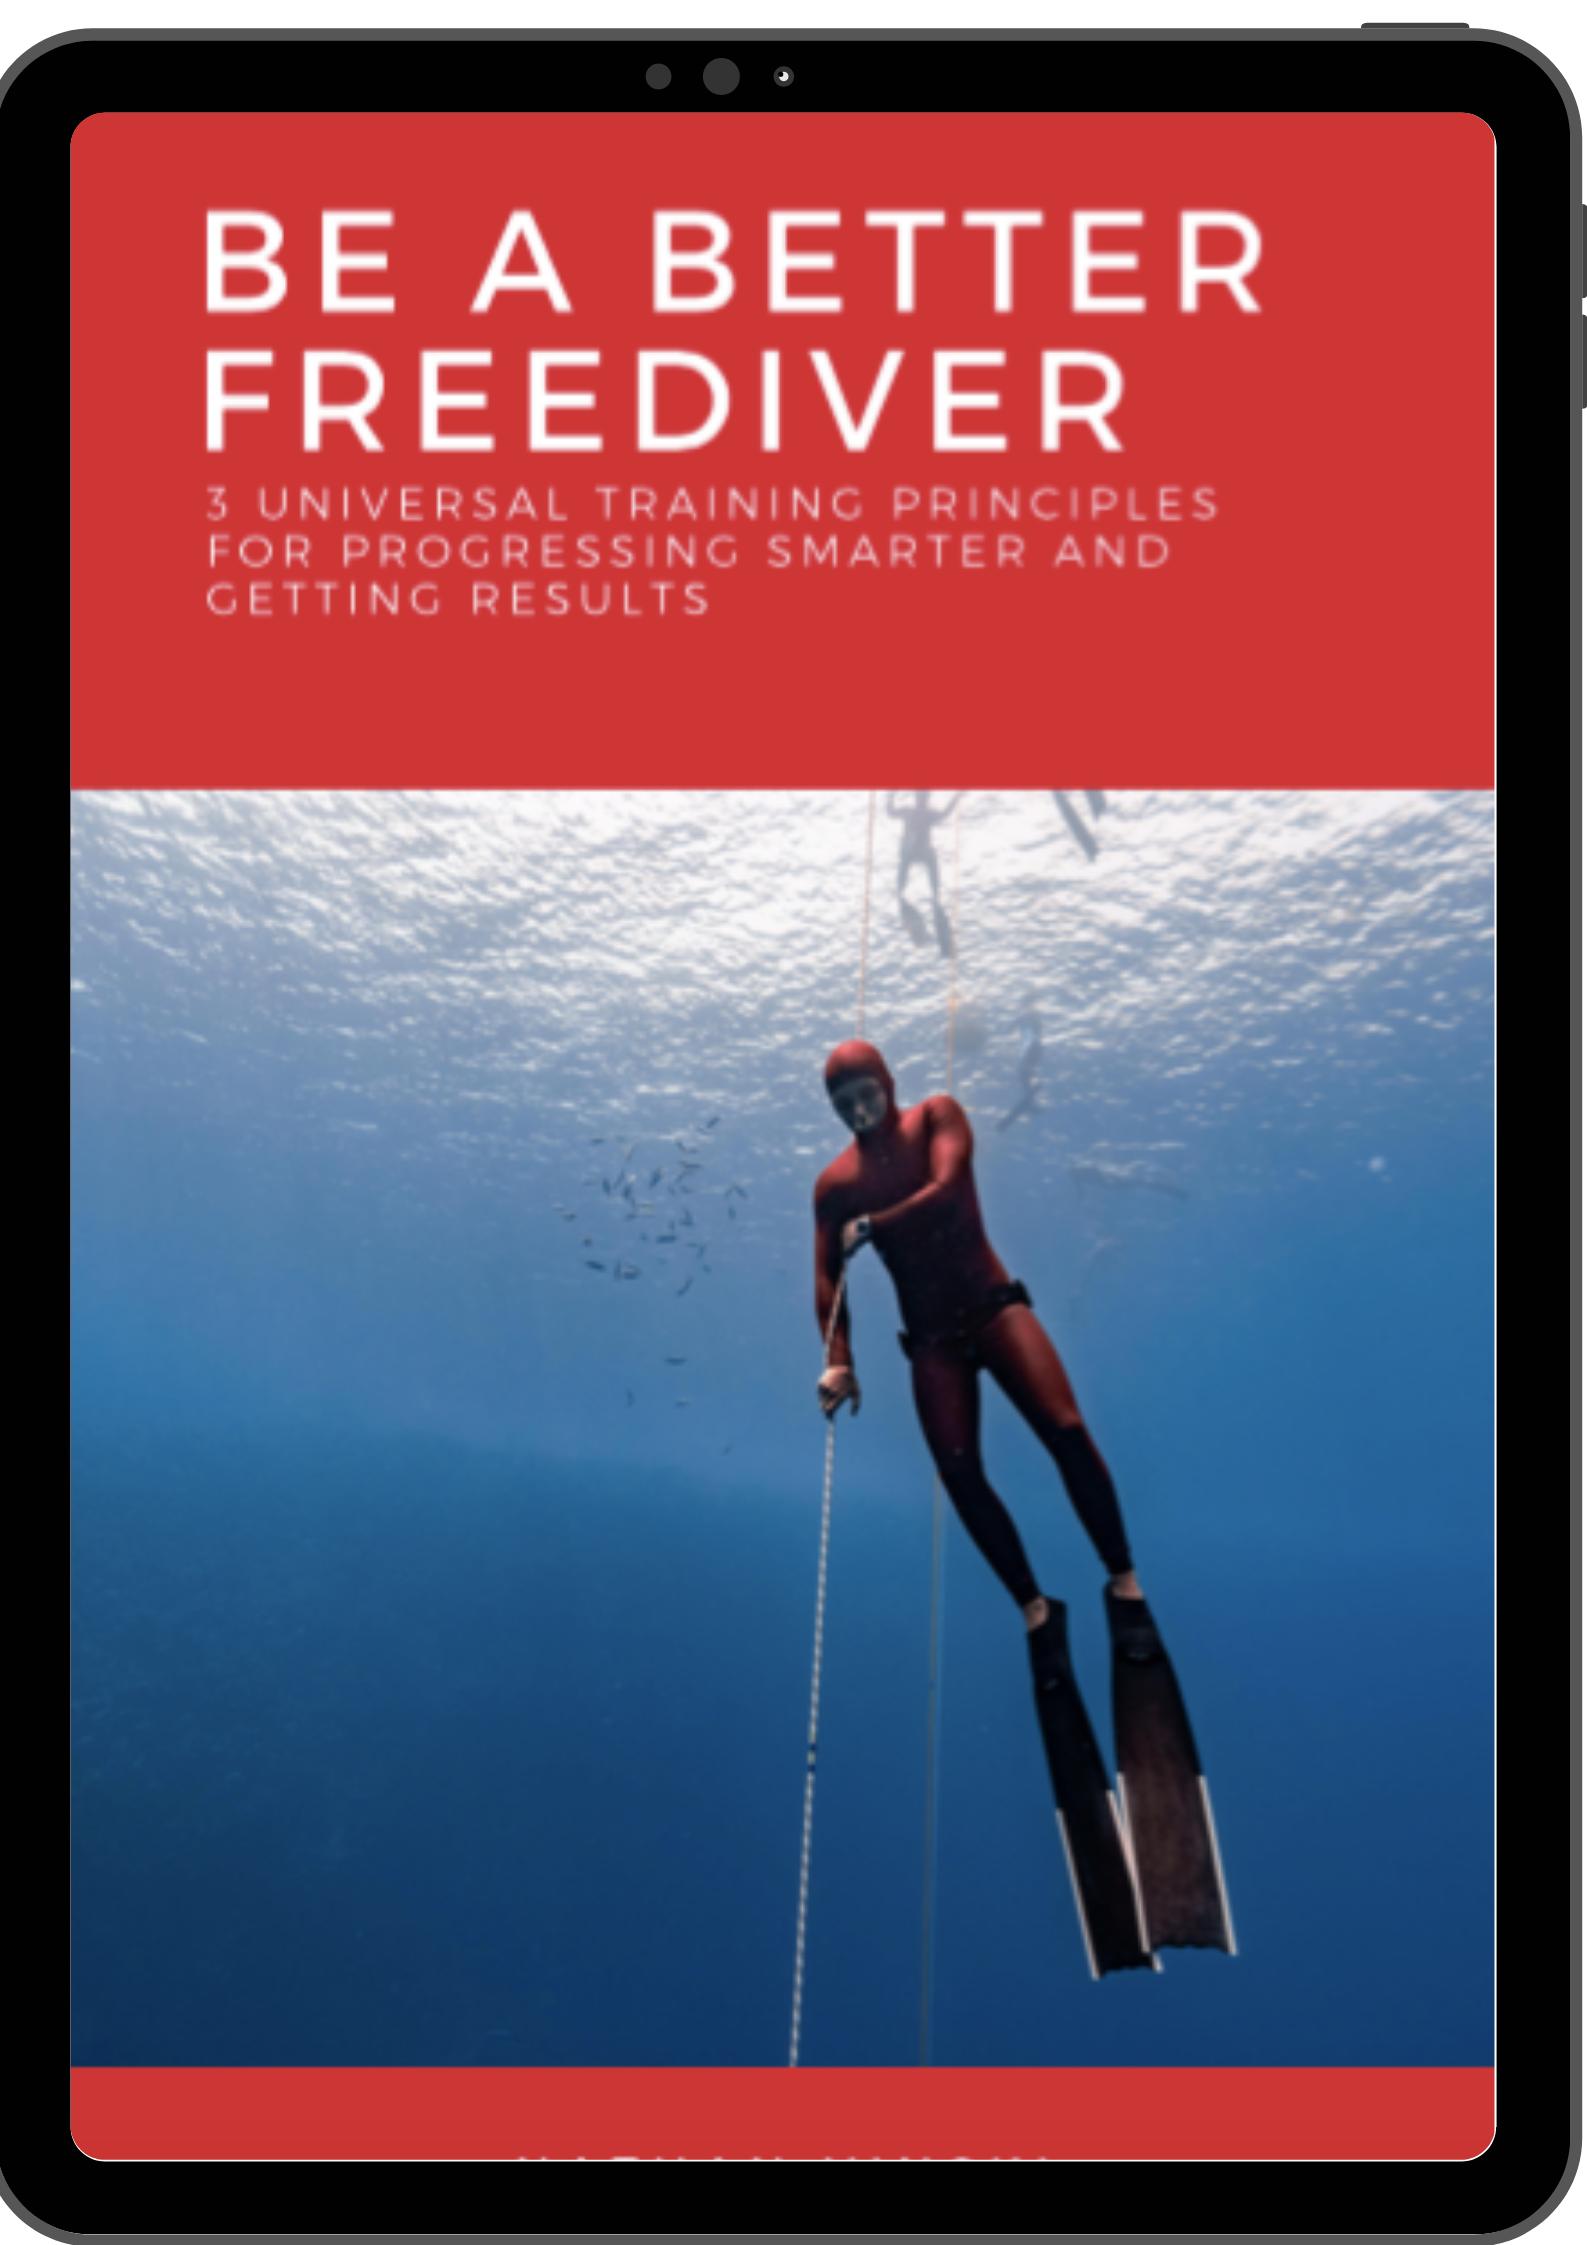 Freediving ebook, freedive book, freedive training, train freediving, nathan vinski freediver